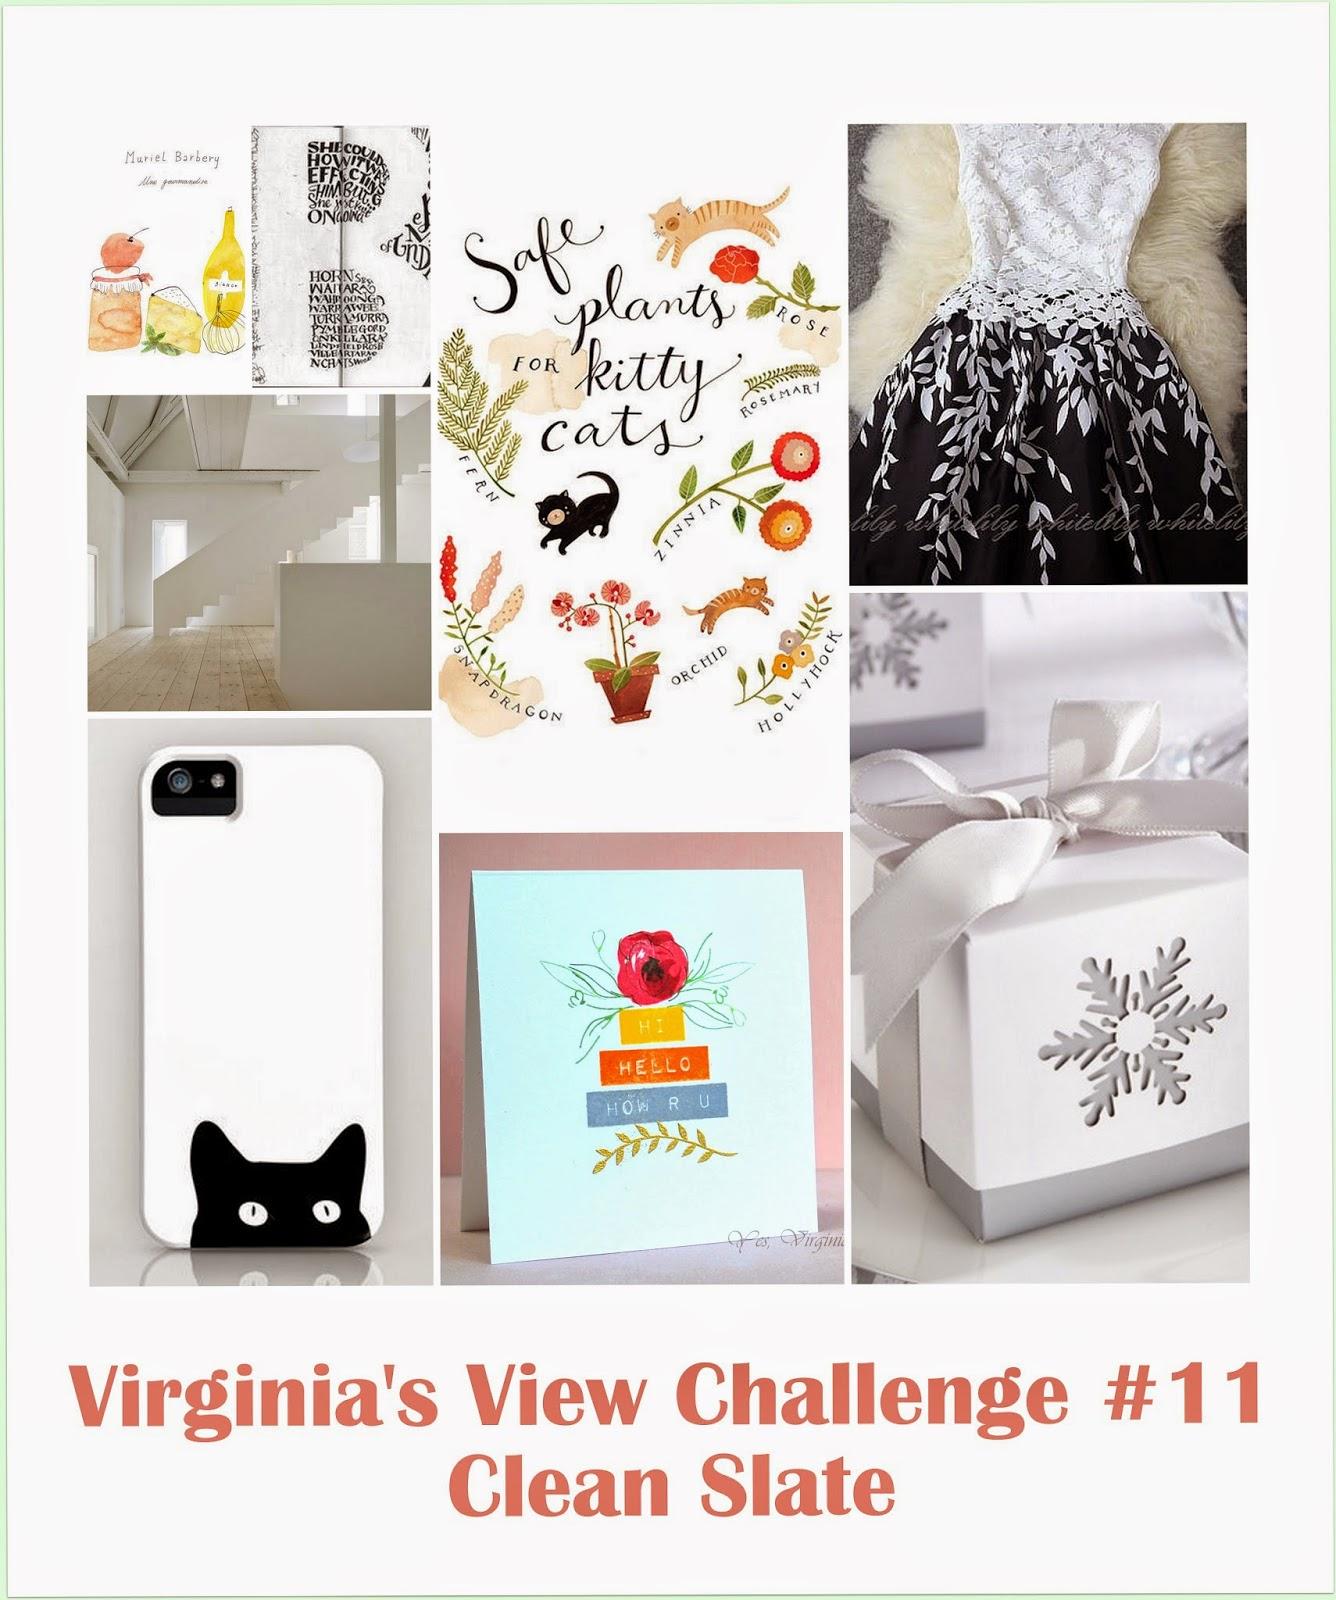 http://virginiasviewchallenge.blogspot.ch/2015/01/virginias-view-challenge-11-clean-slate.html